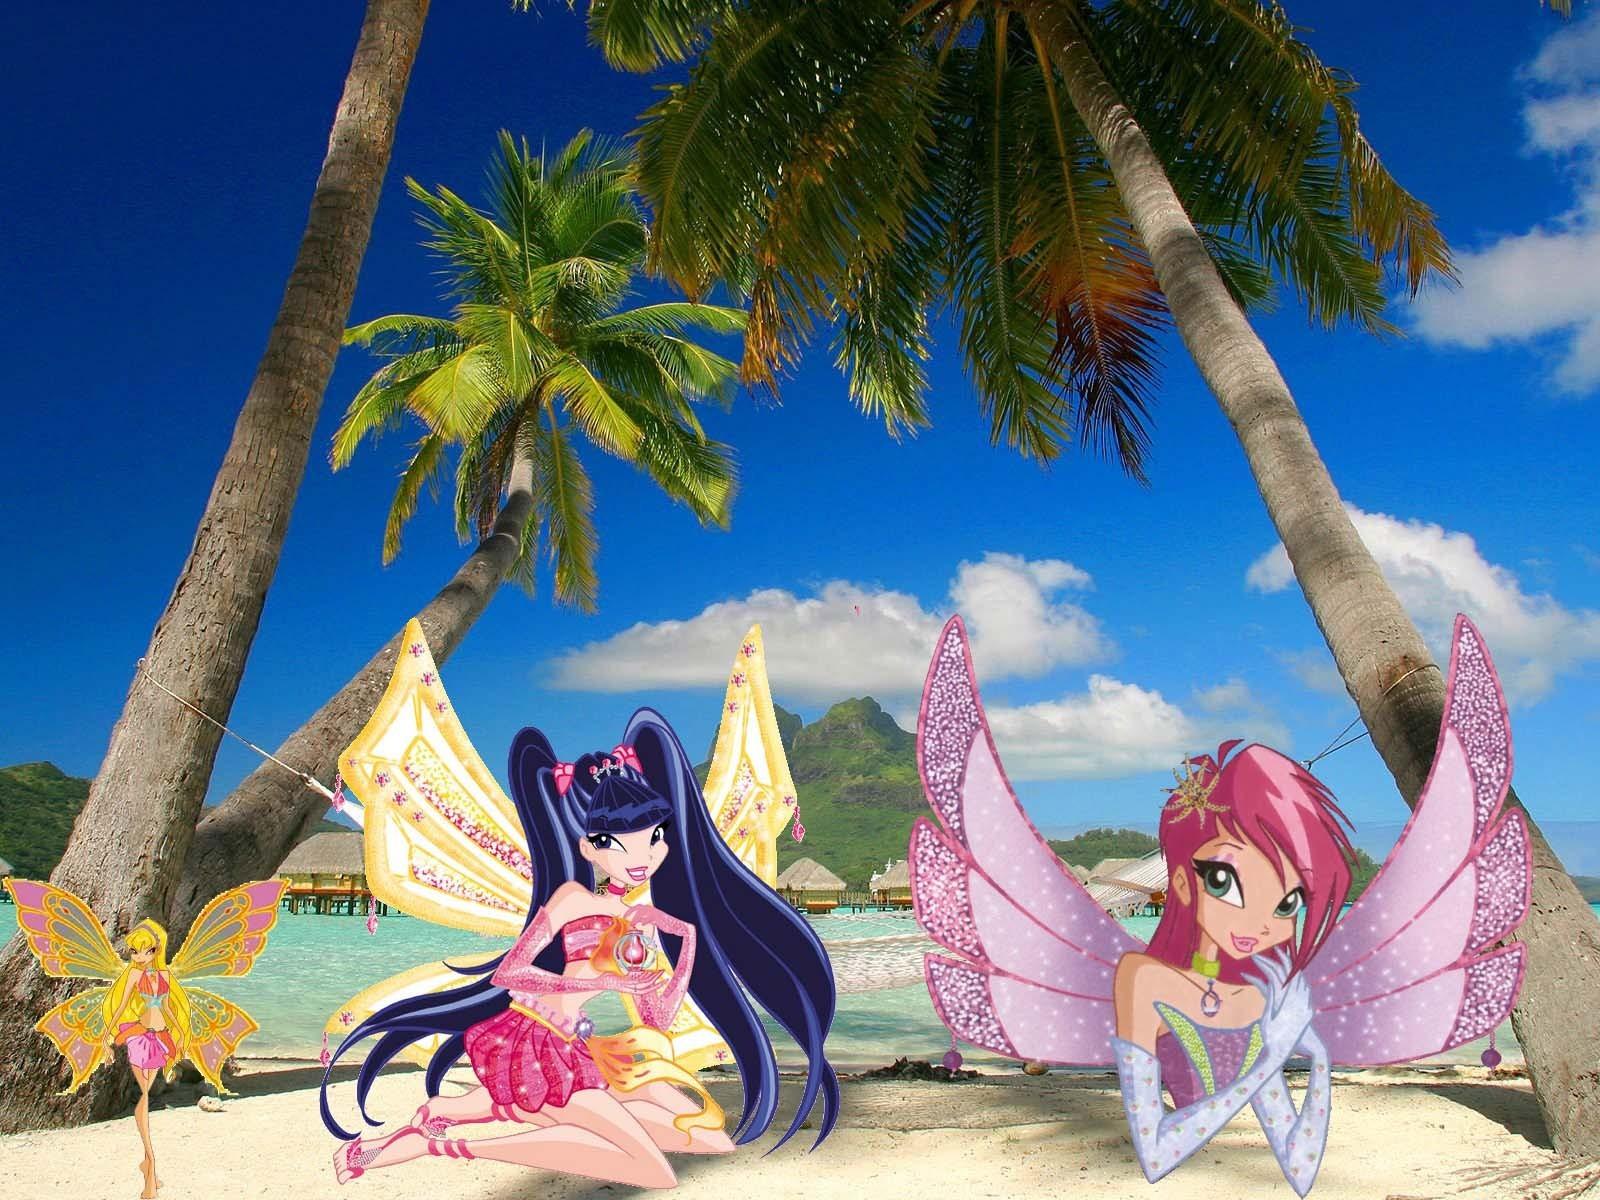 Bora-Bora-Winx-Club-Enchantix-the-winx-club-17266128-1600-1200